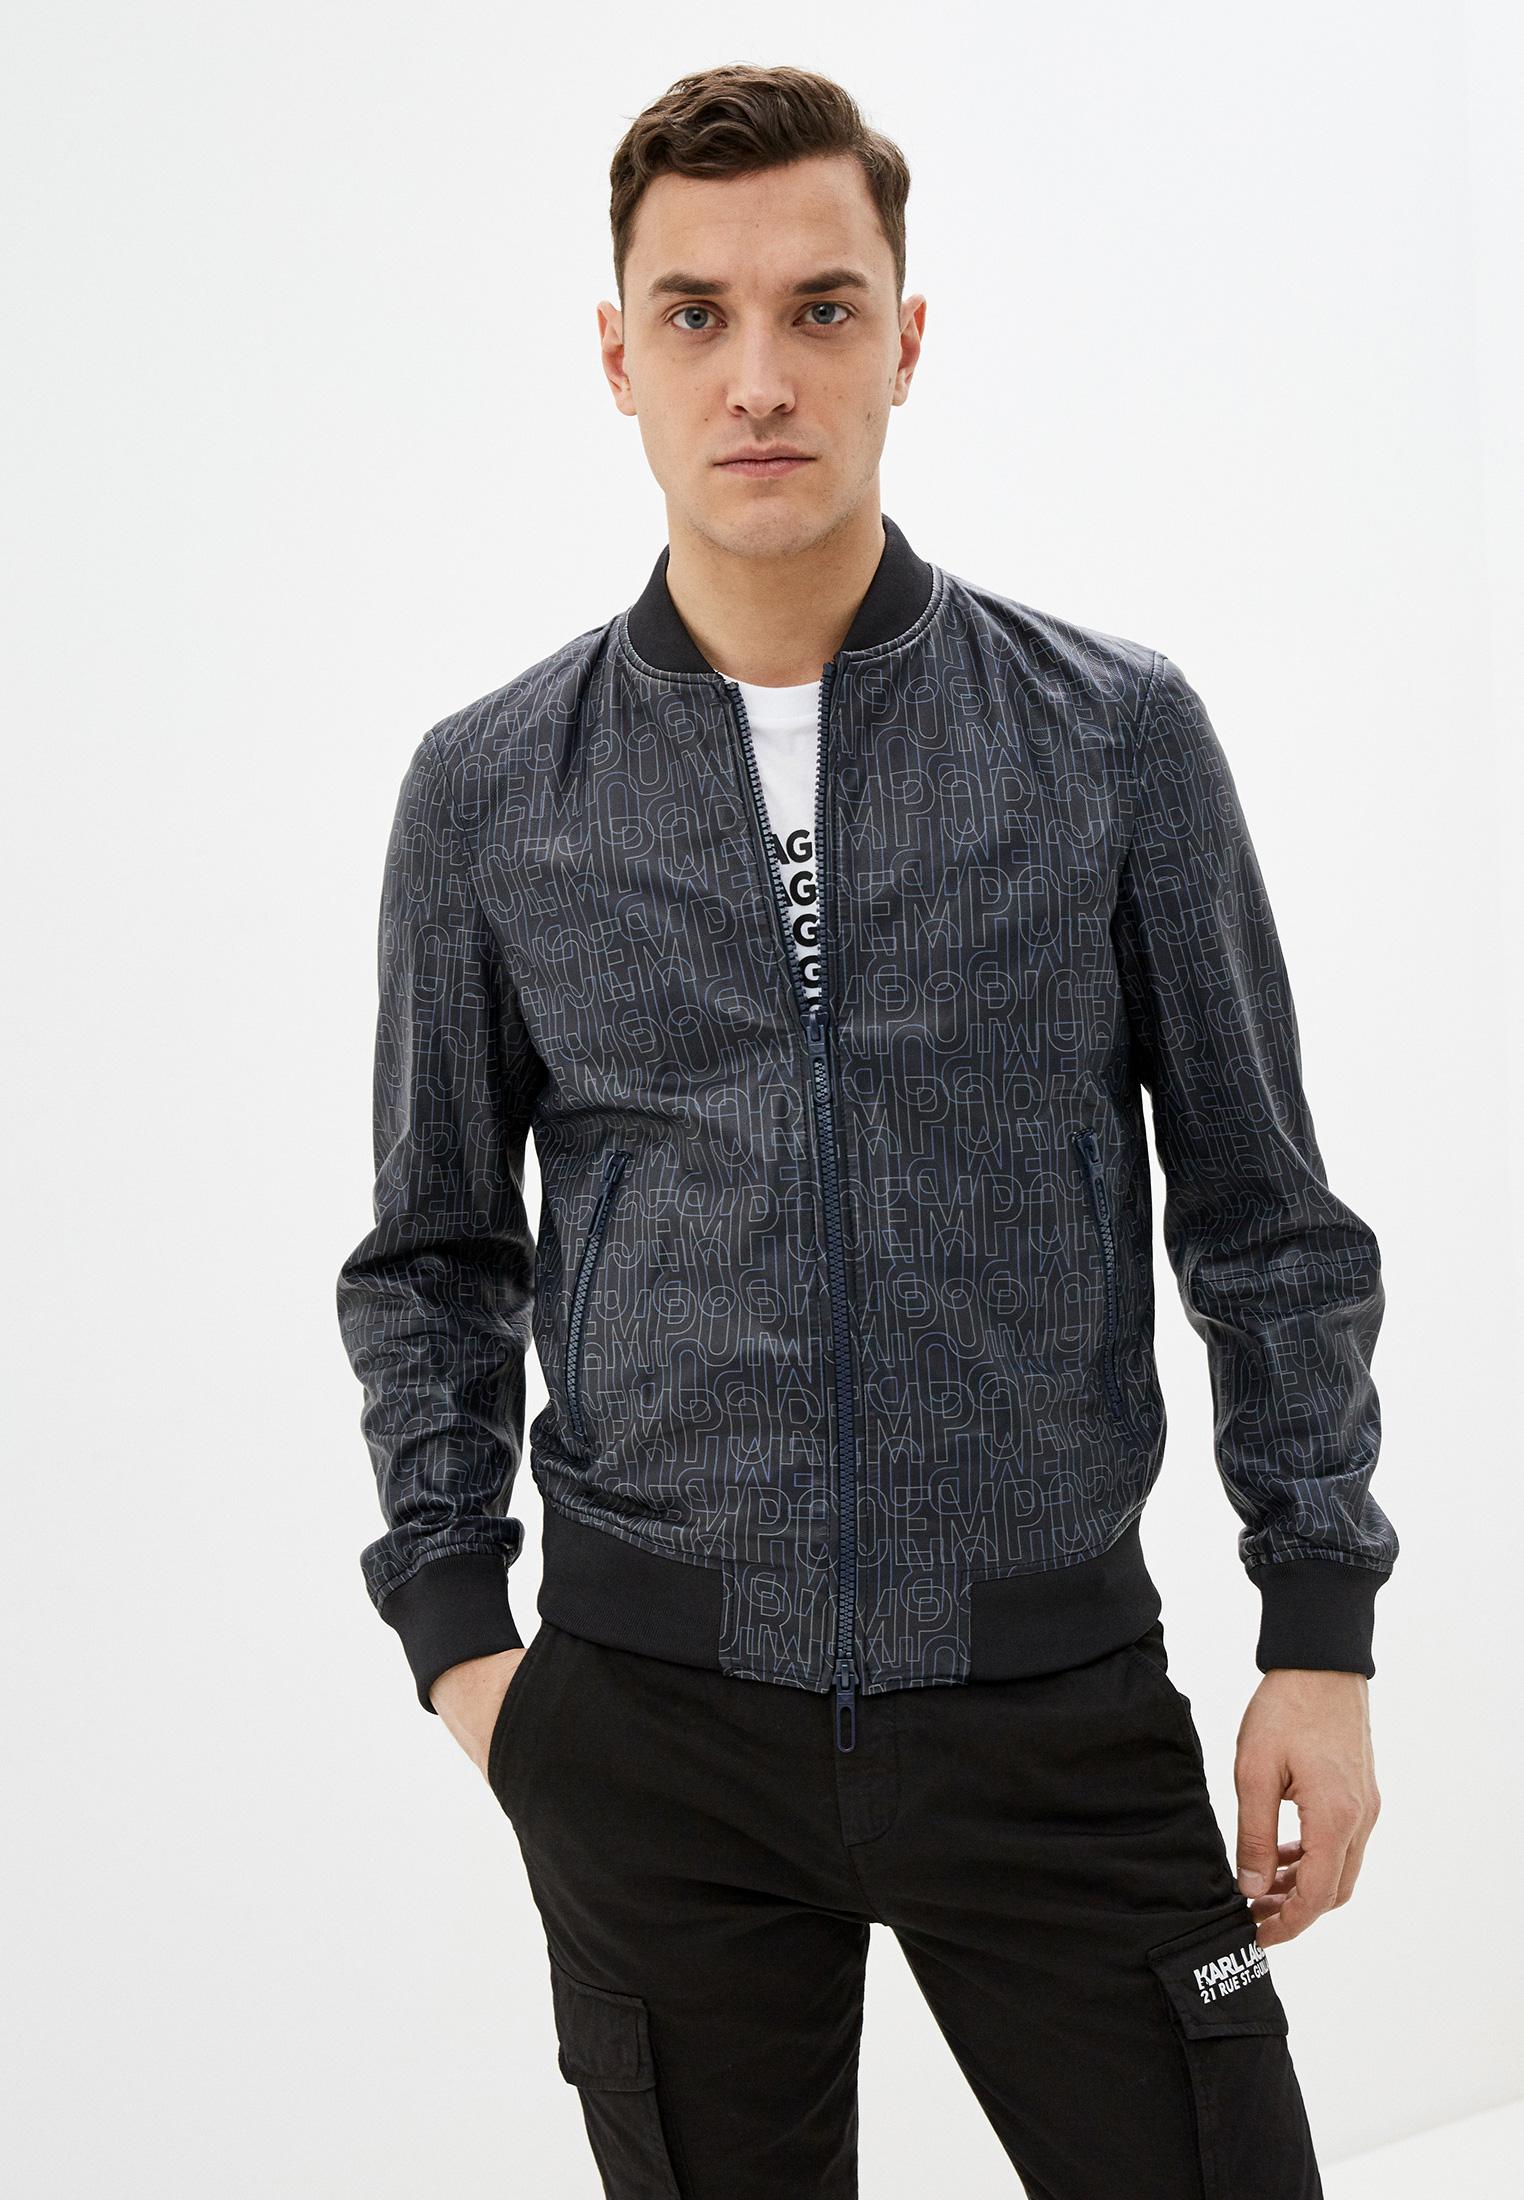 Кожаная куртка Emporio Armani 51b54p 51P54